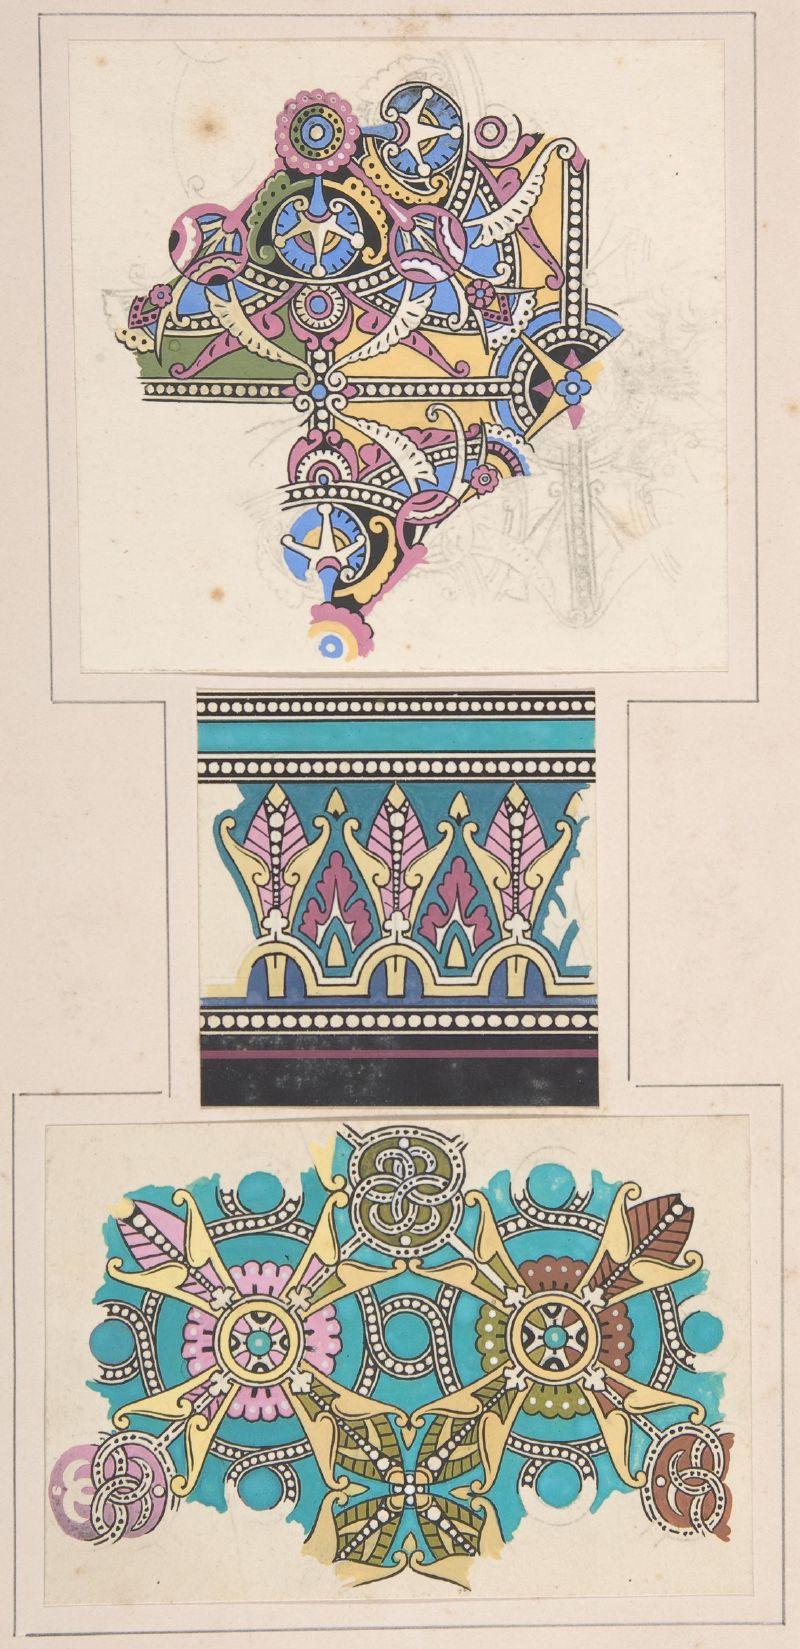 Design drawing (ca. 1883)